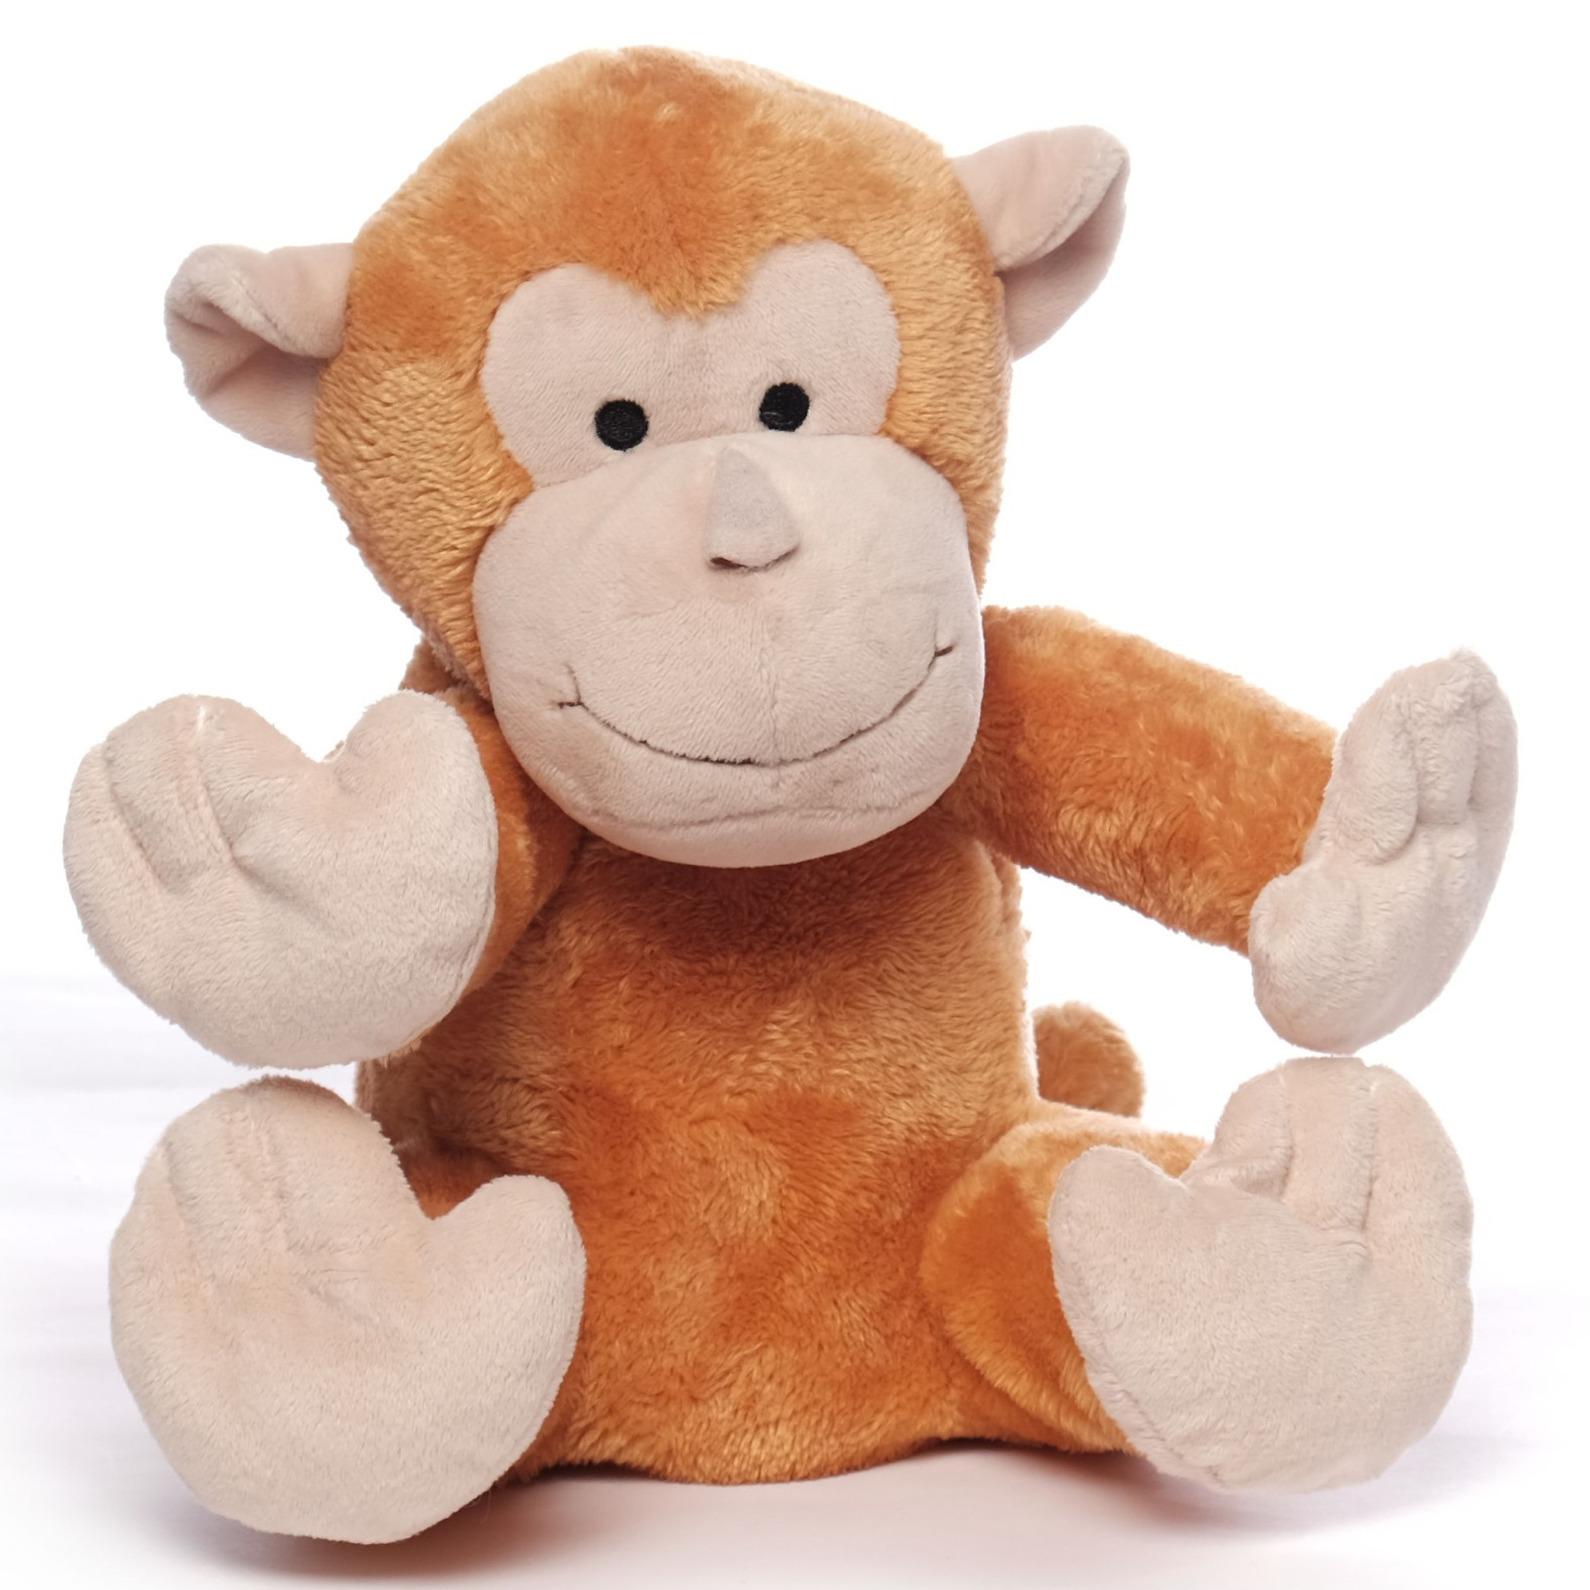 Magnetron warmte knuffel orang oetan aap bruin 26 cm